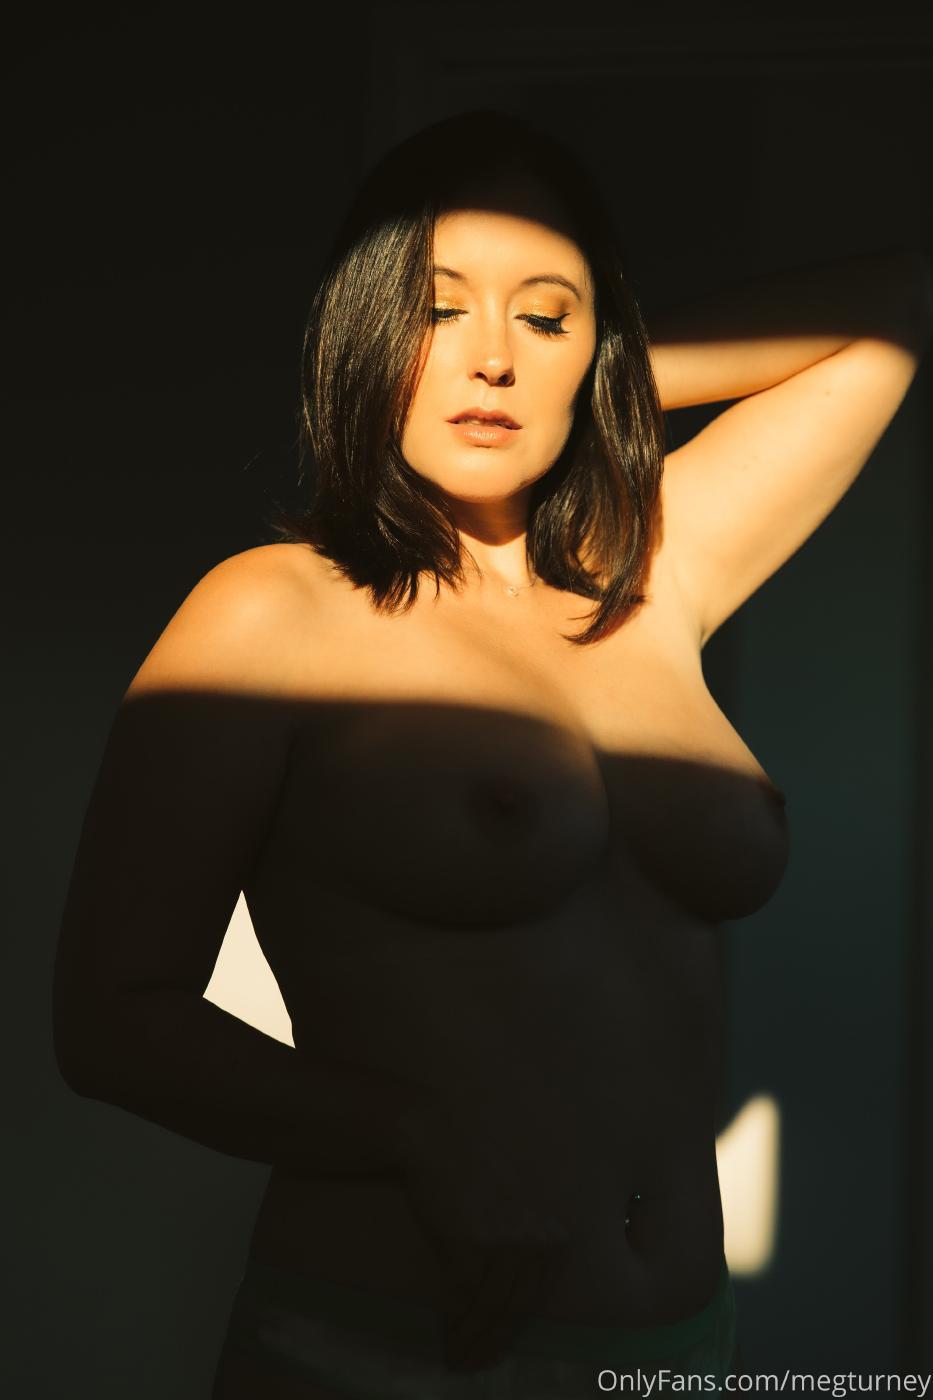 Meg Turney Nude Sunset Onlyfans Set Leaked Lrcivi